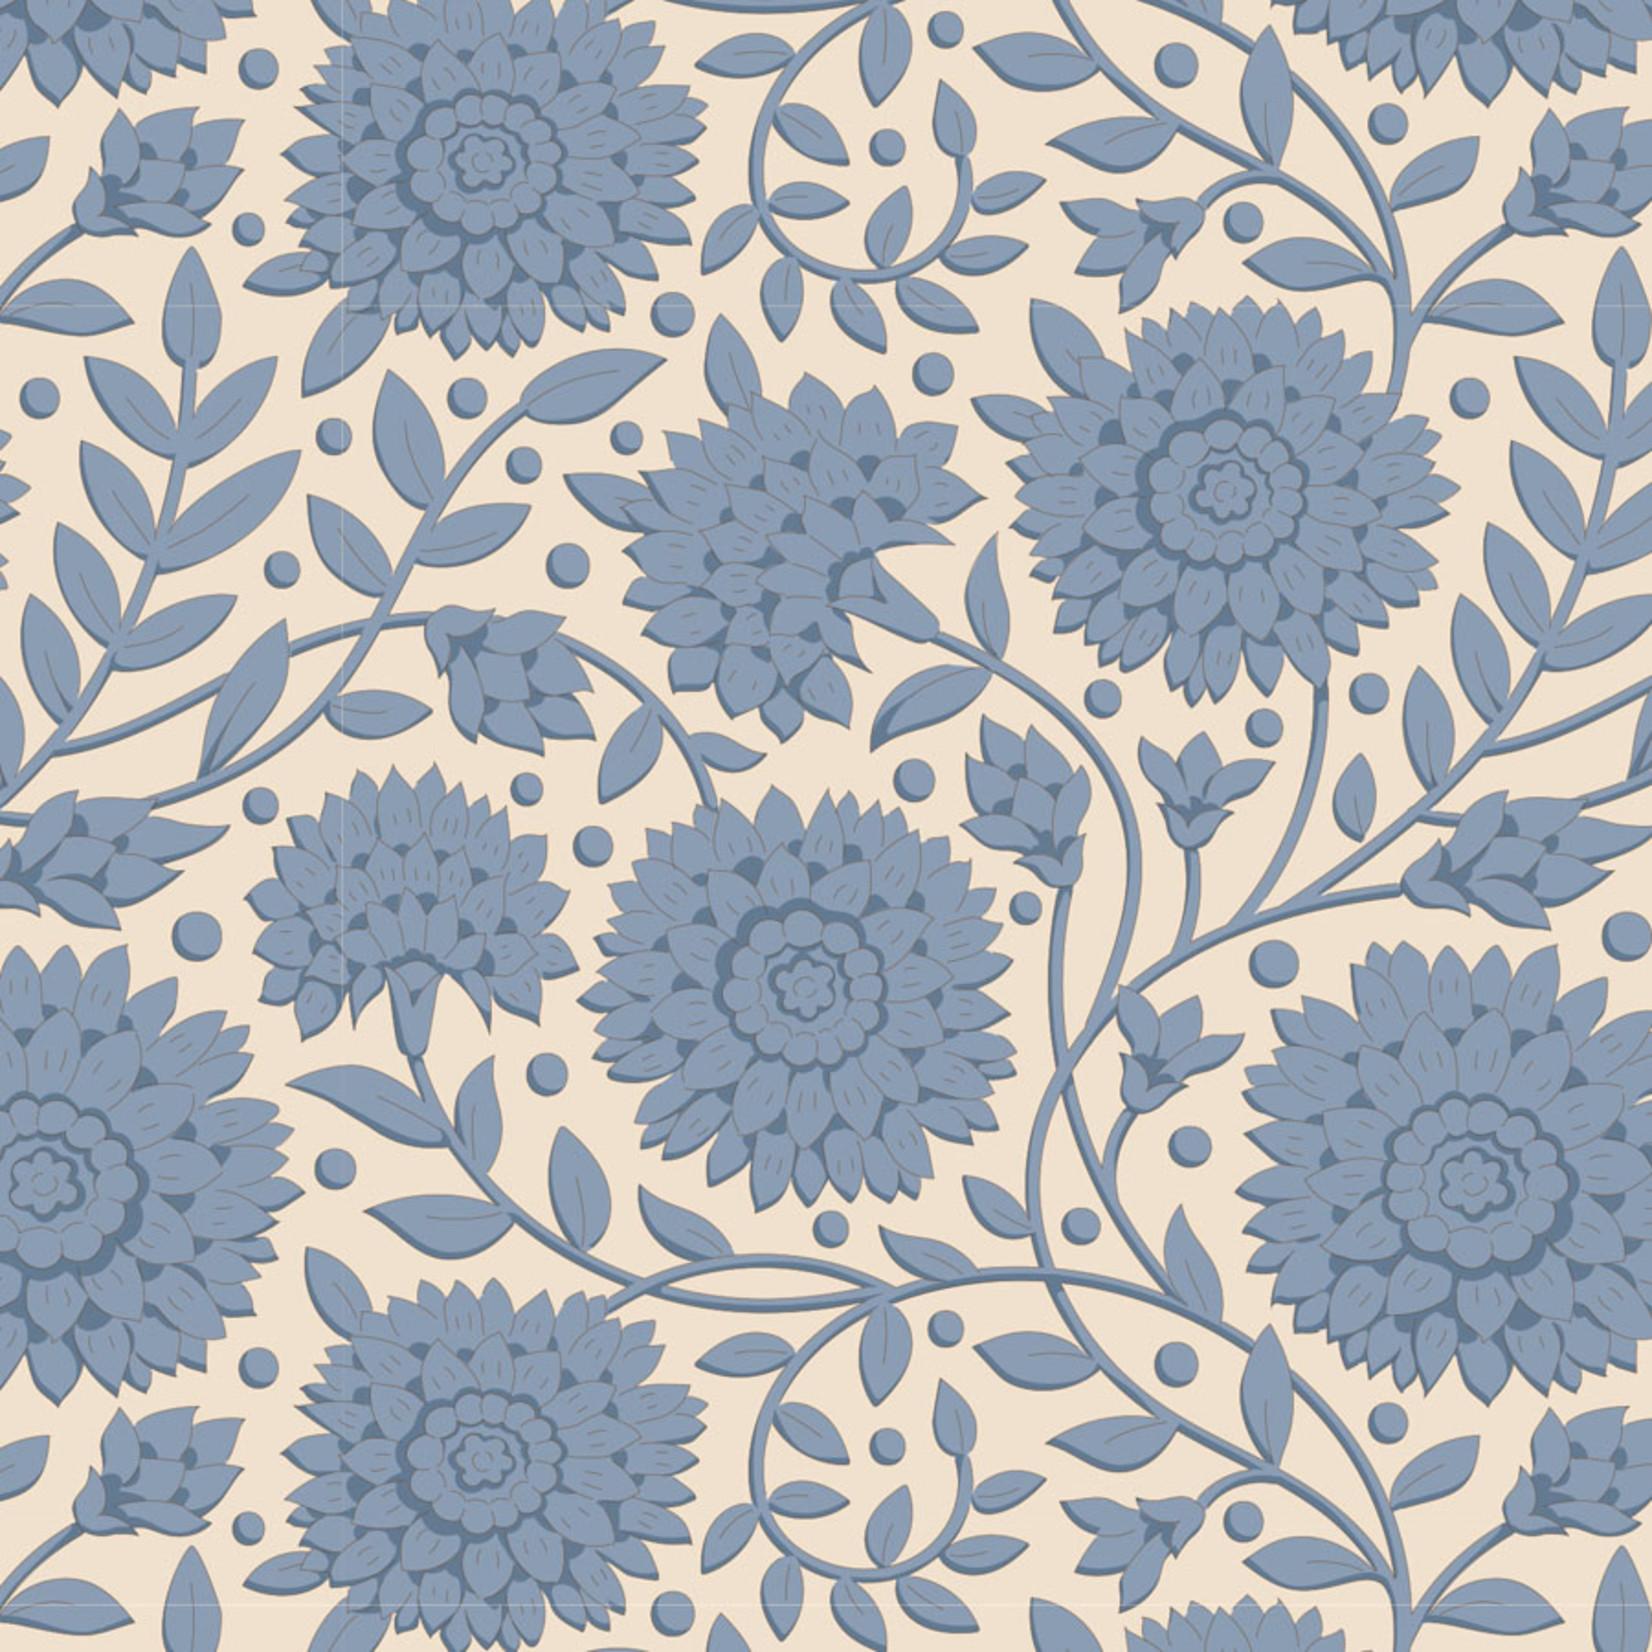 Tilda Windy Days, Aella Blenders, Blue 110030 $0.20 per cm or $20/m